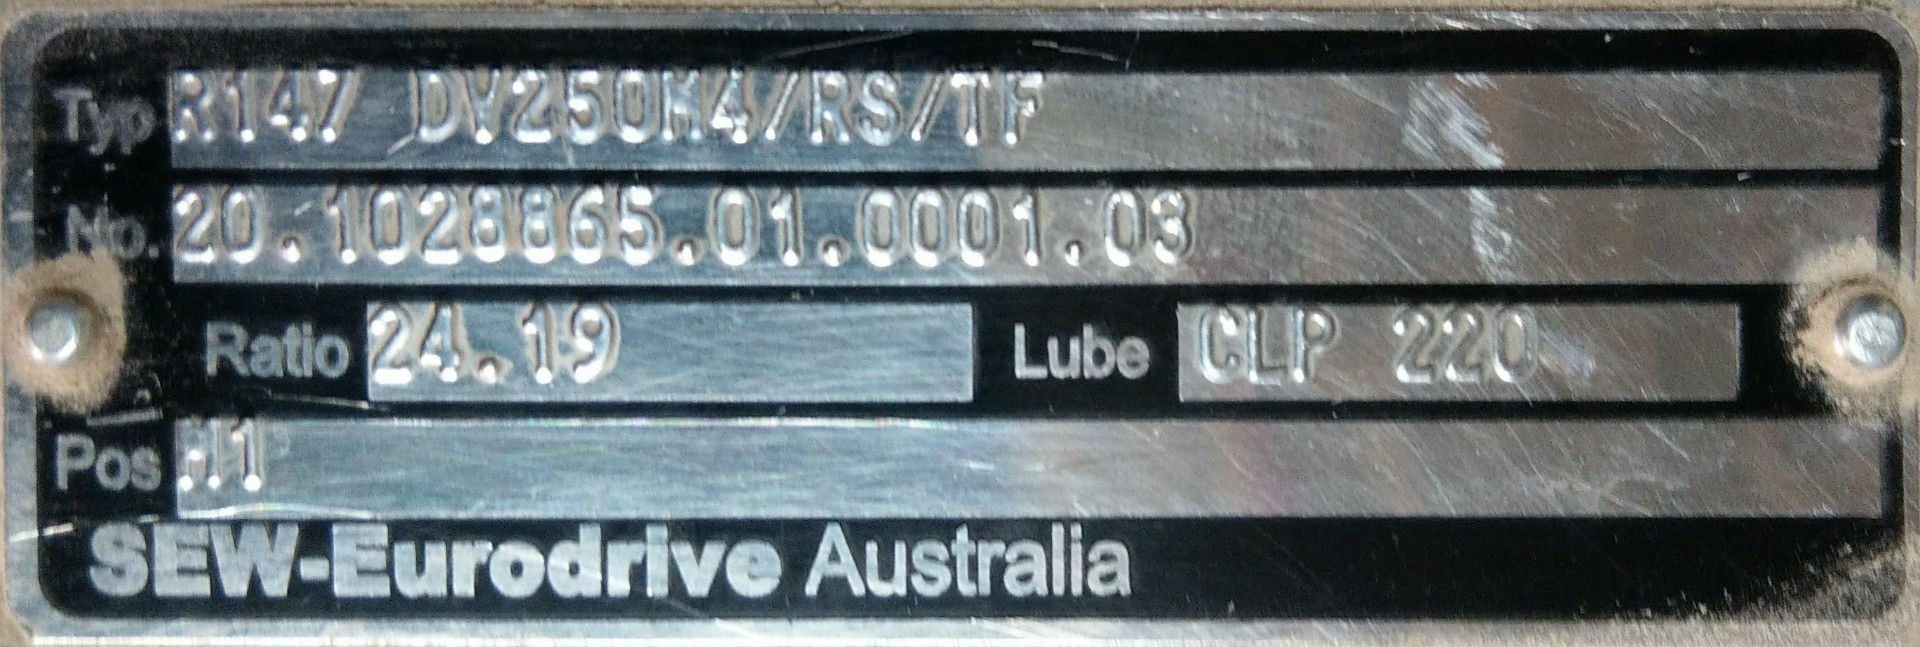 EV001 - Gearbox Tag.jpg